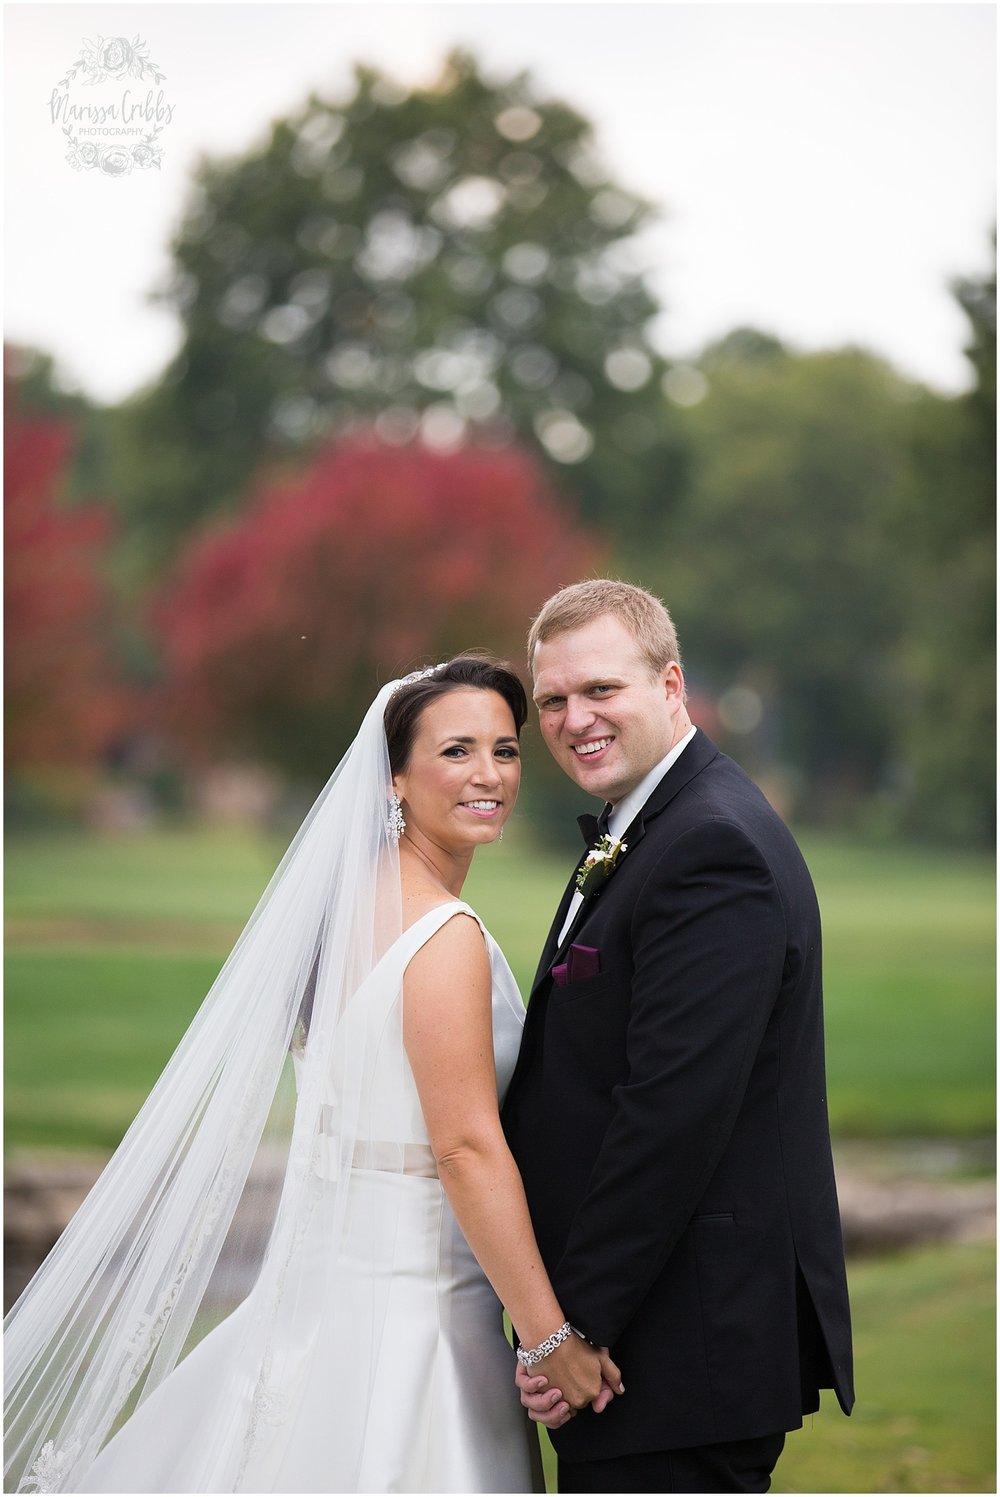 Blue Hills Country Club Wedding | Marissa Cribbs Photography | Nolte's Bridal | KC Wedding Photographer | KC Weddings_1182.jpg